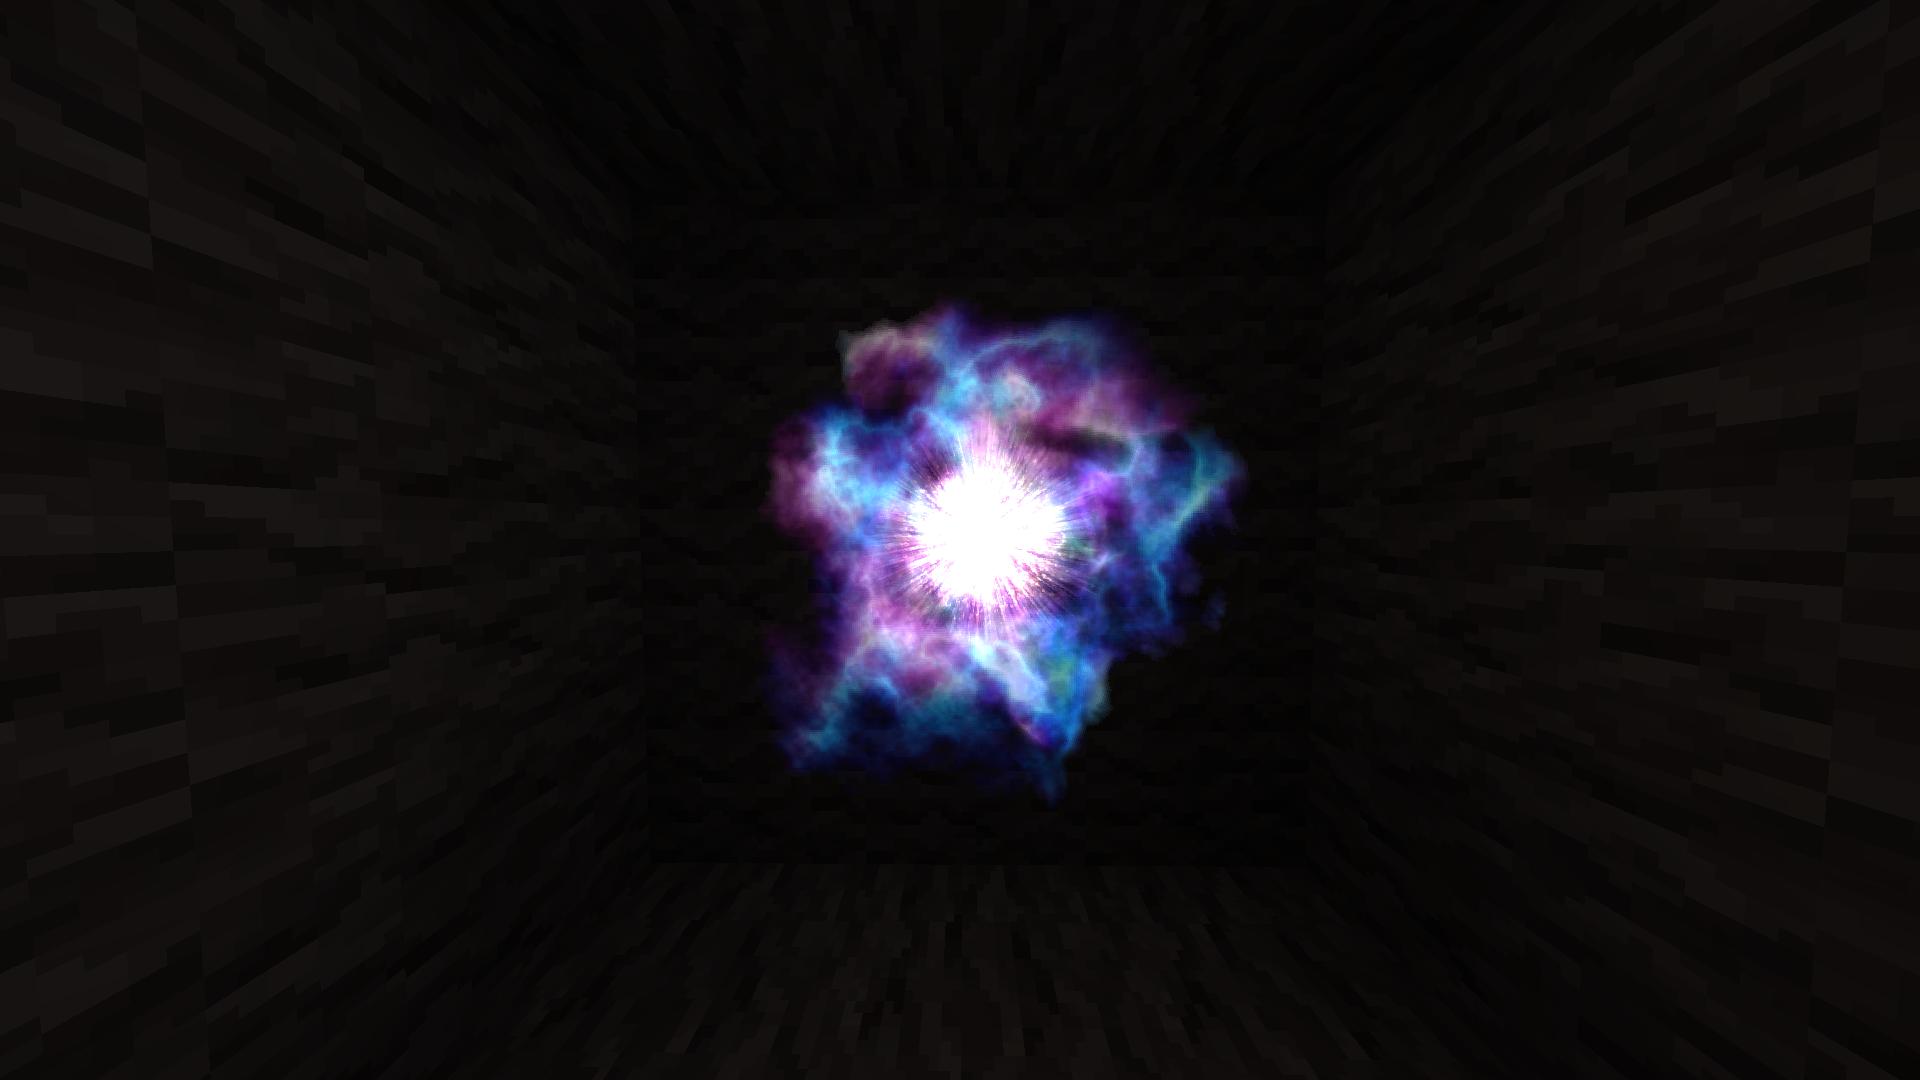 Abstract Light 1920x1080